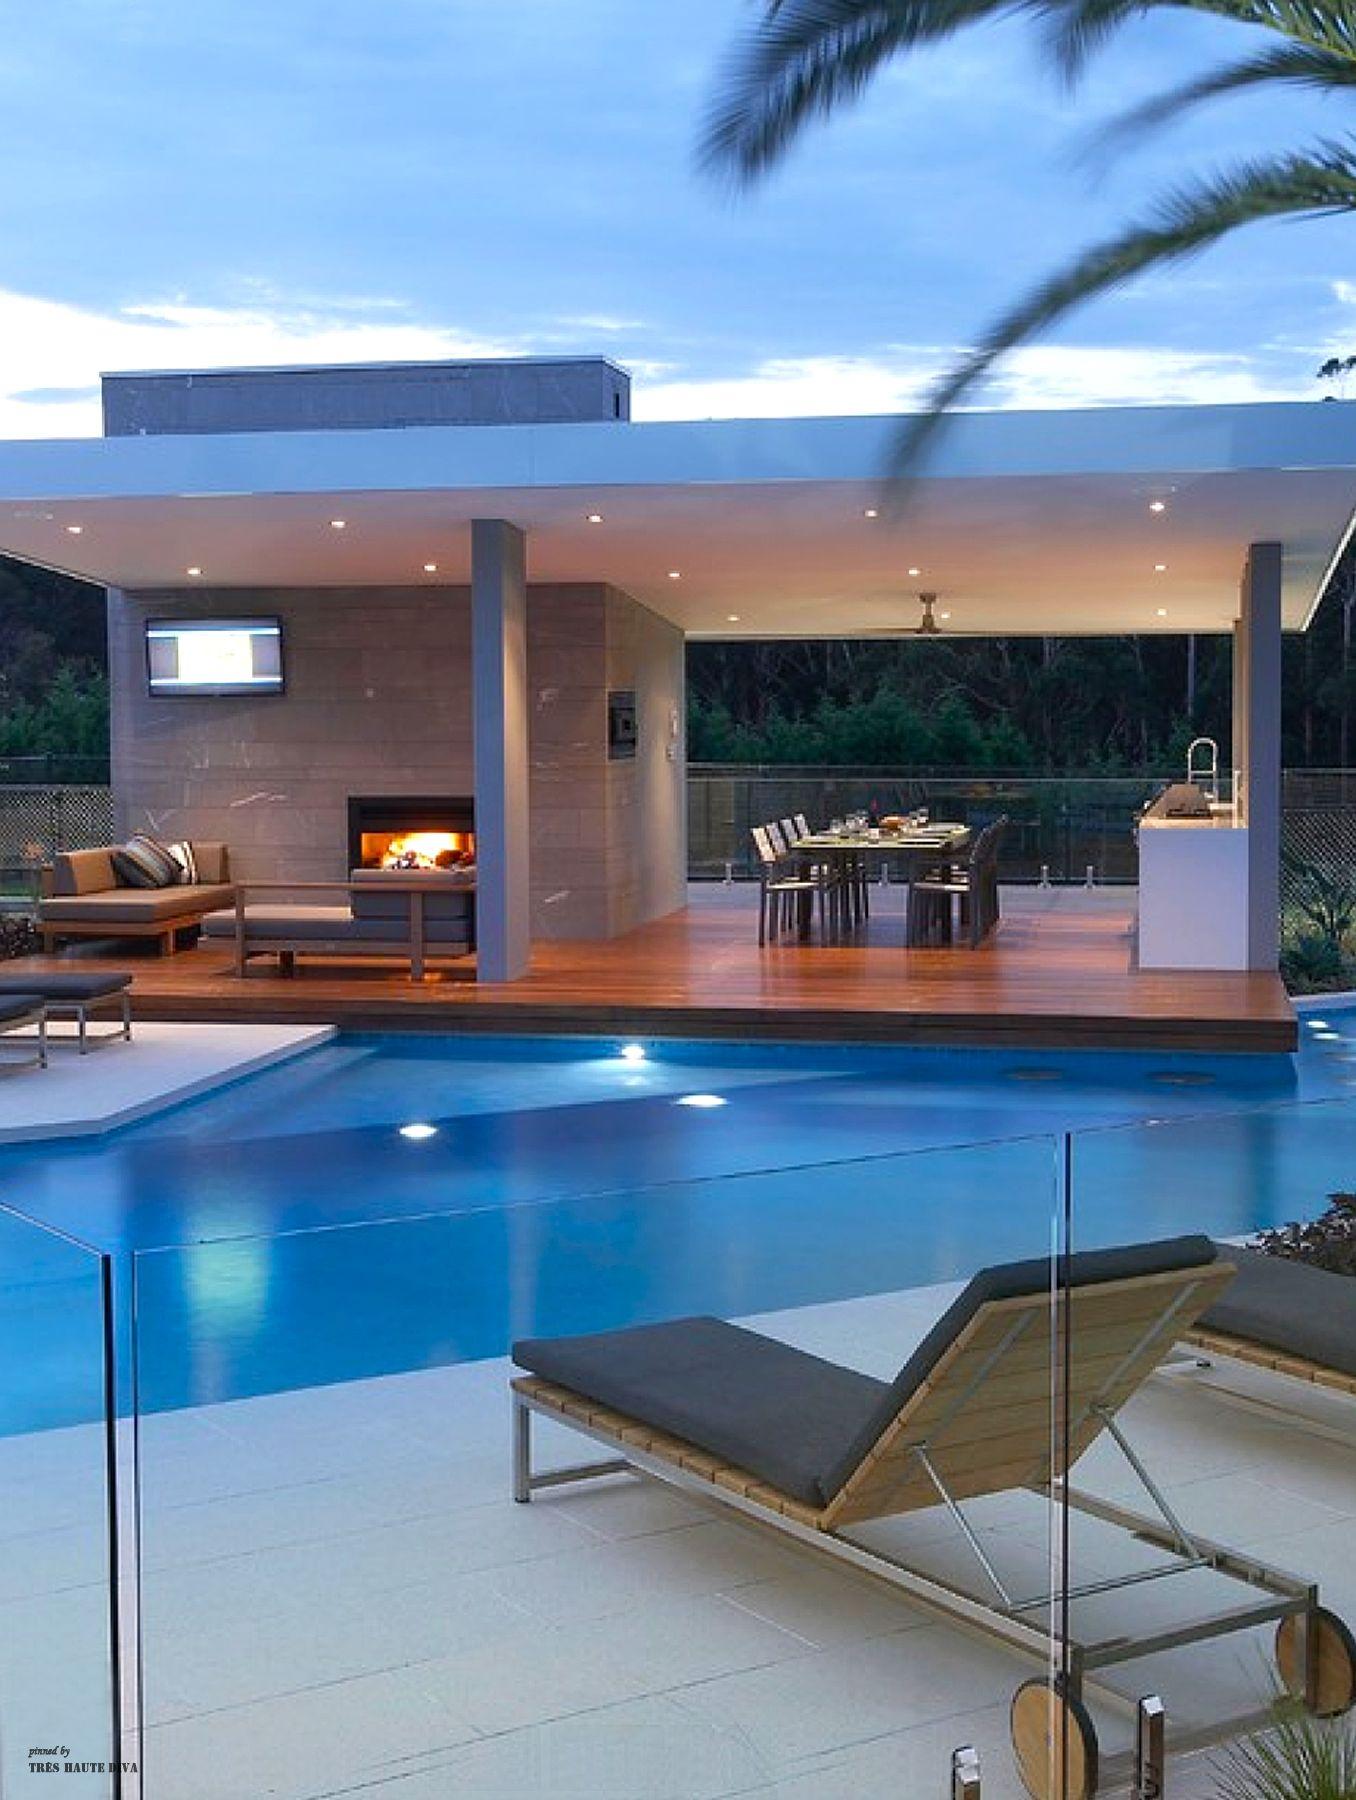 Pool Sydney Modern Pools Swimming Pool Designs Pool Houses